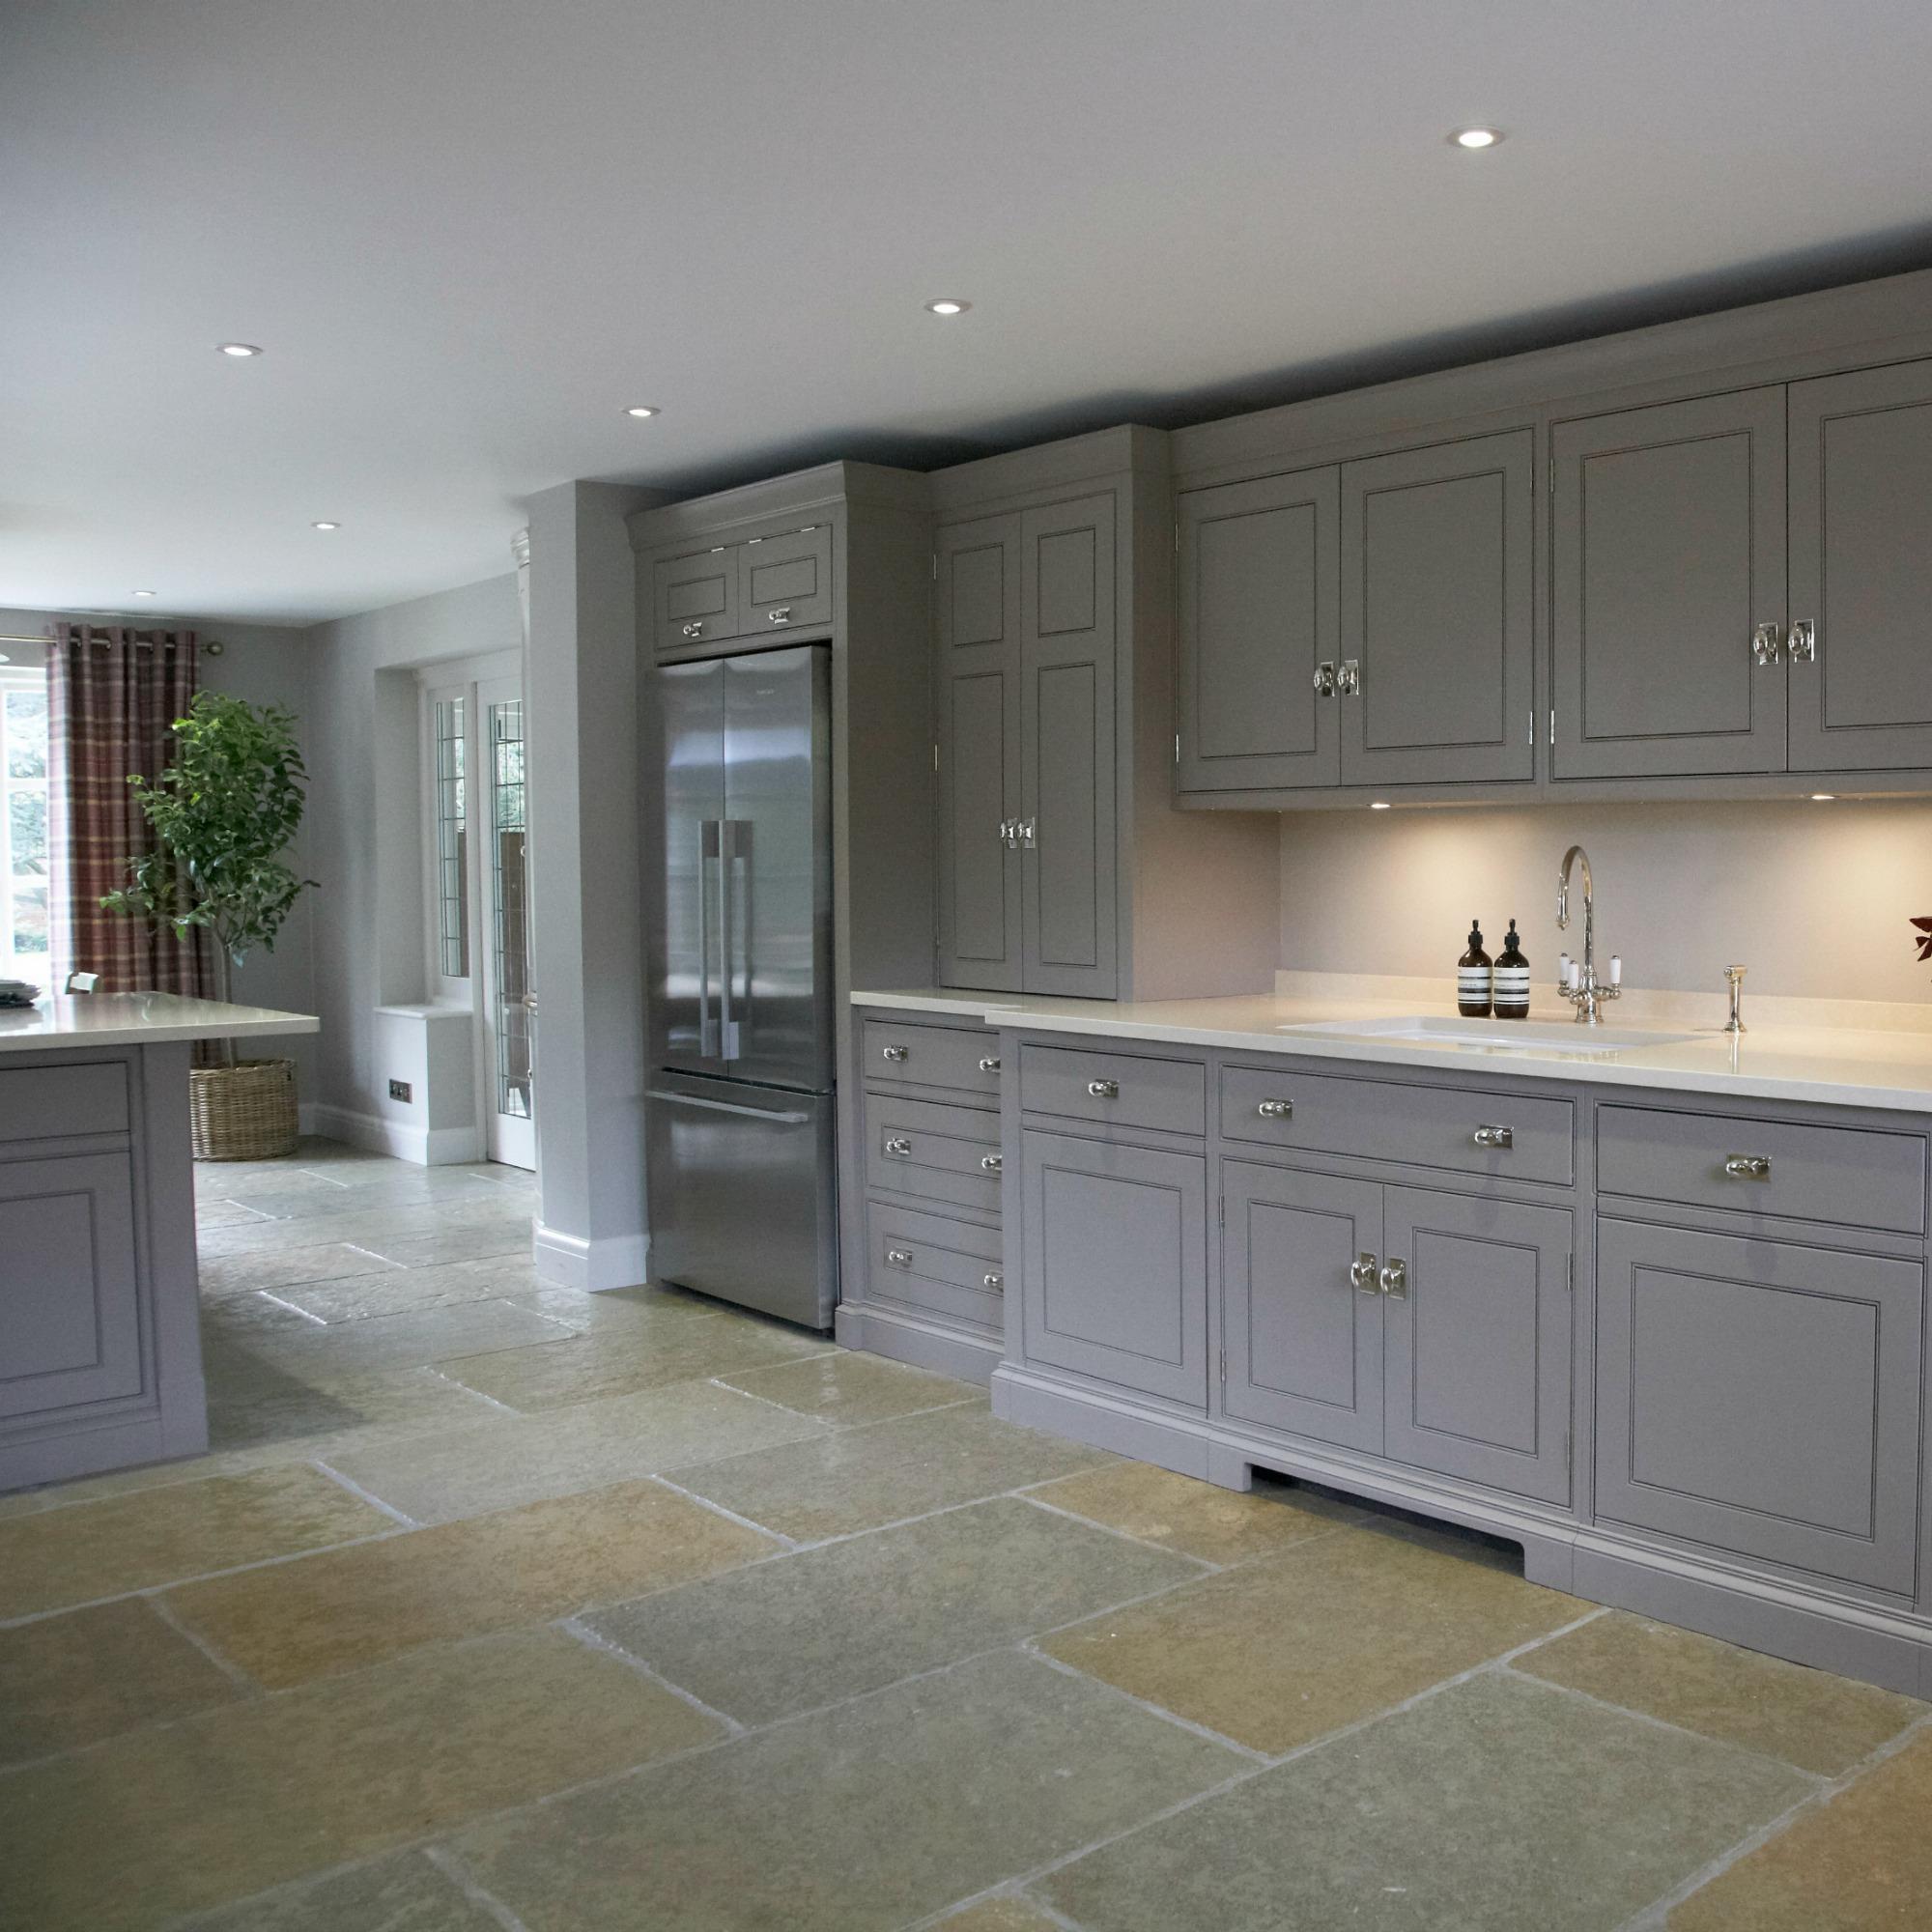 Bespoke Kitchens luxury bespoke kitchen, harpenden, hertfordshire FOVLGDS